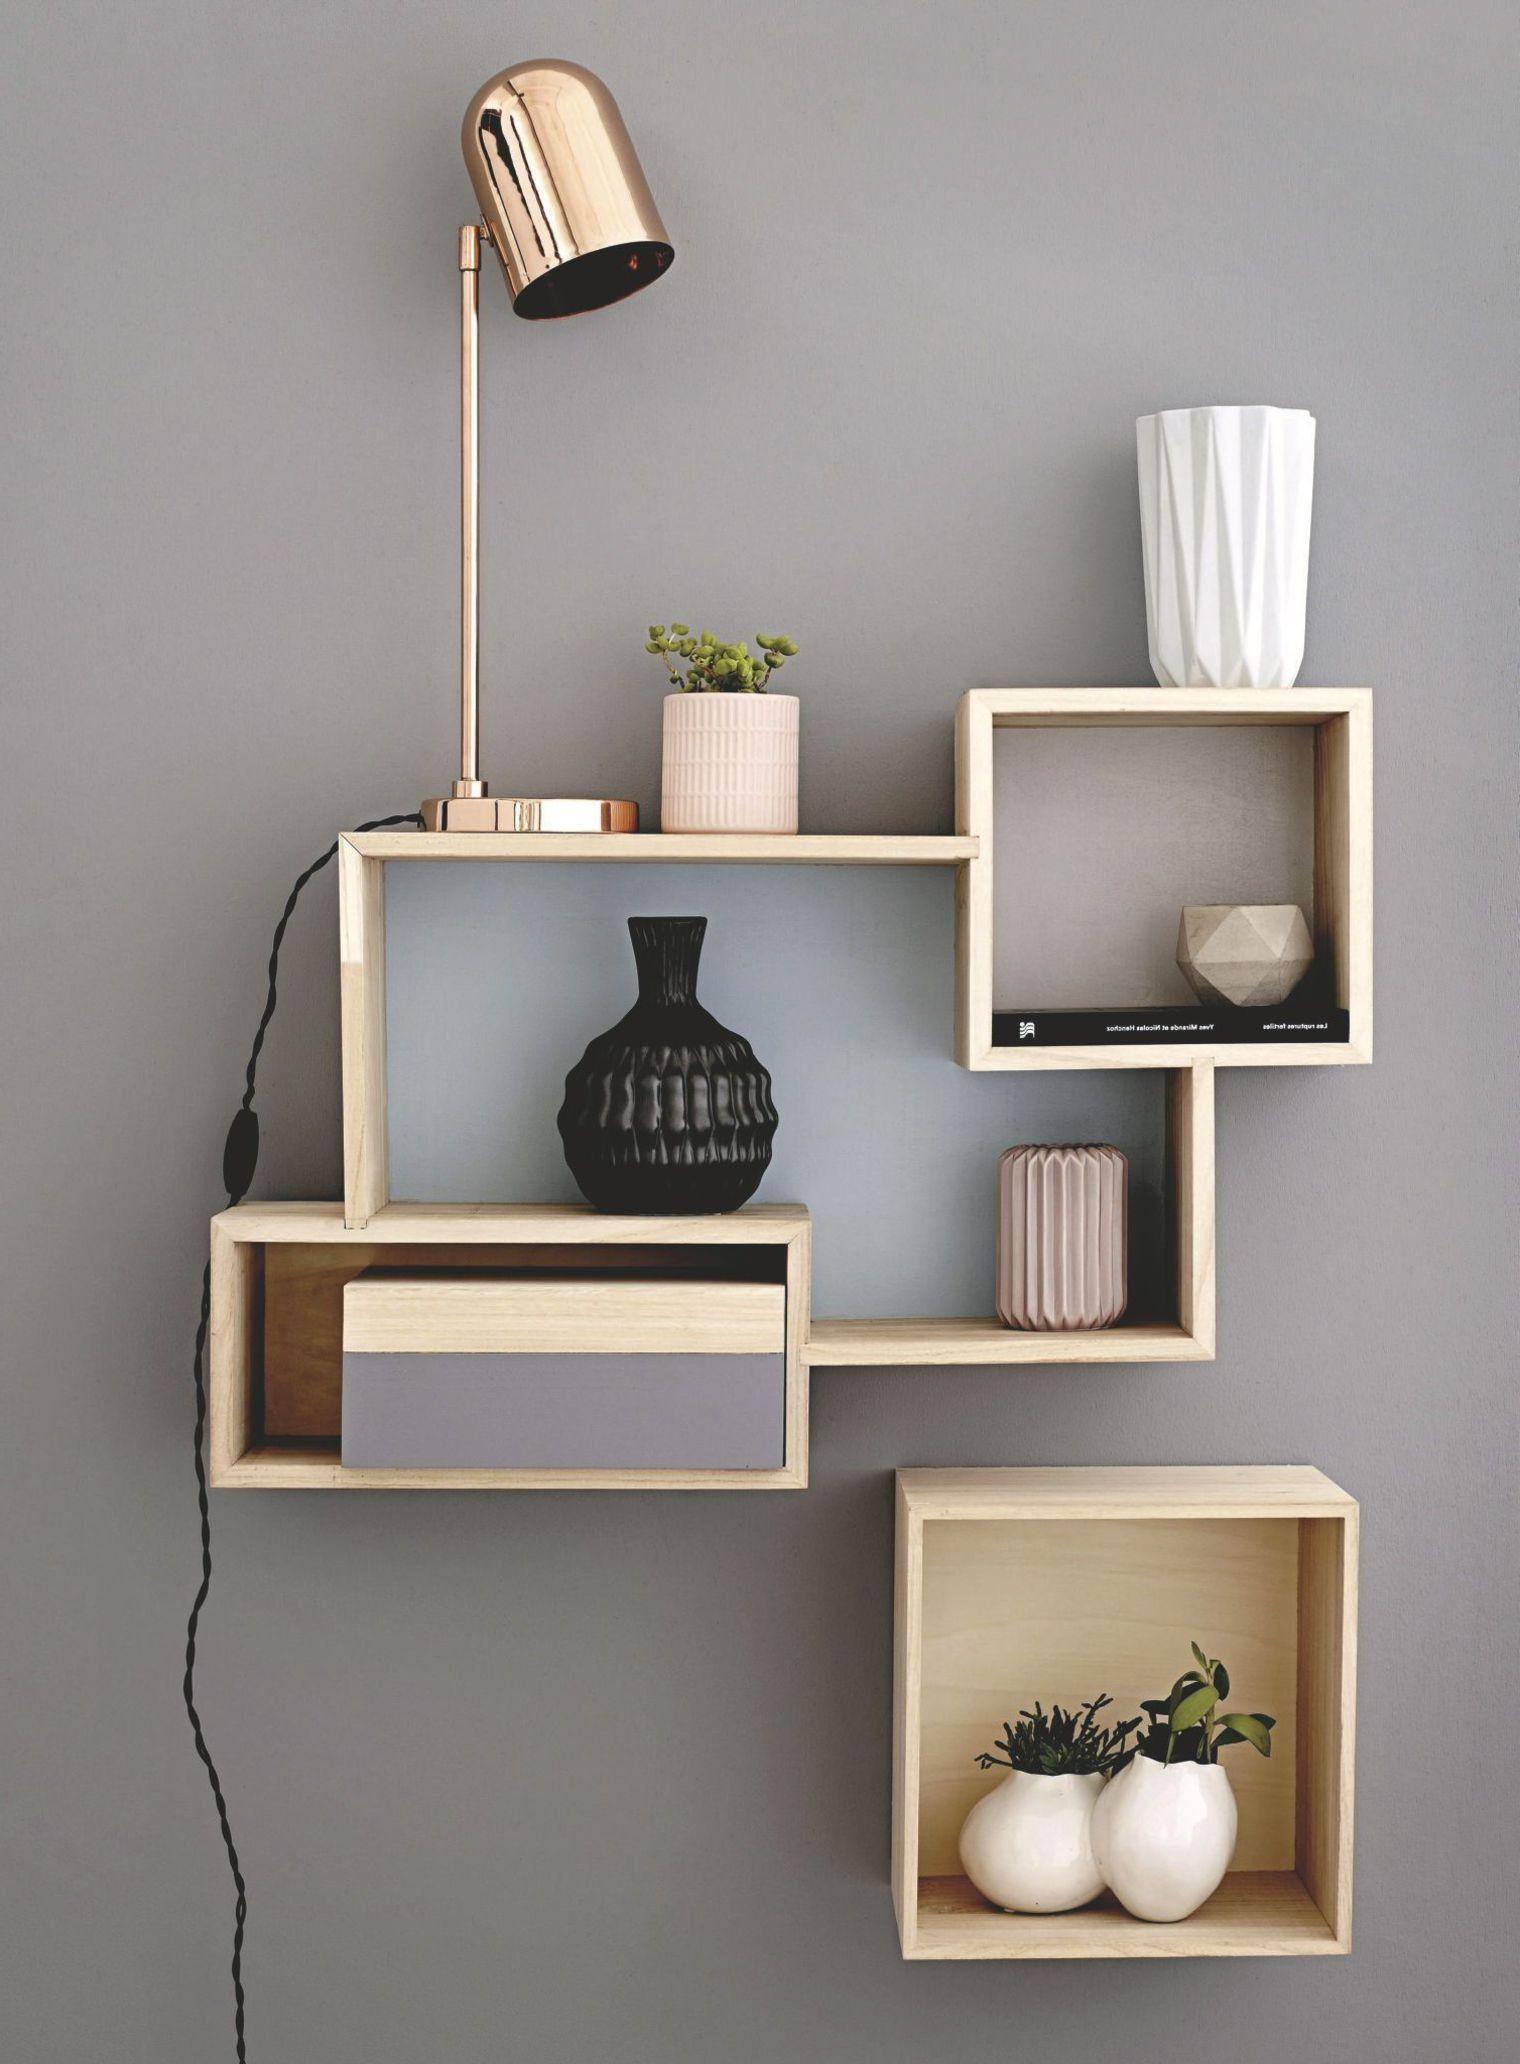 Etagere Murale Ikea in 19  Geometric furniture, Decor, Home diy